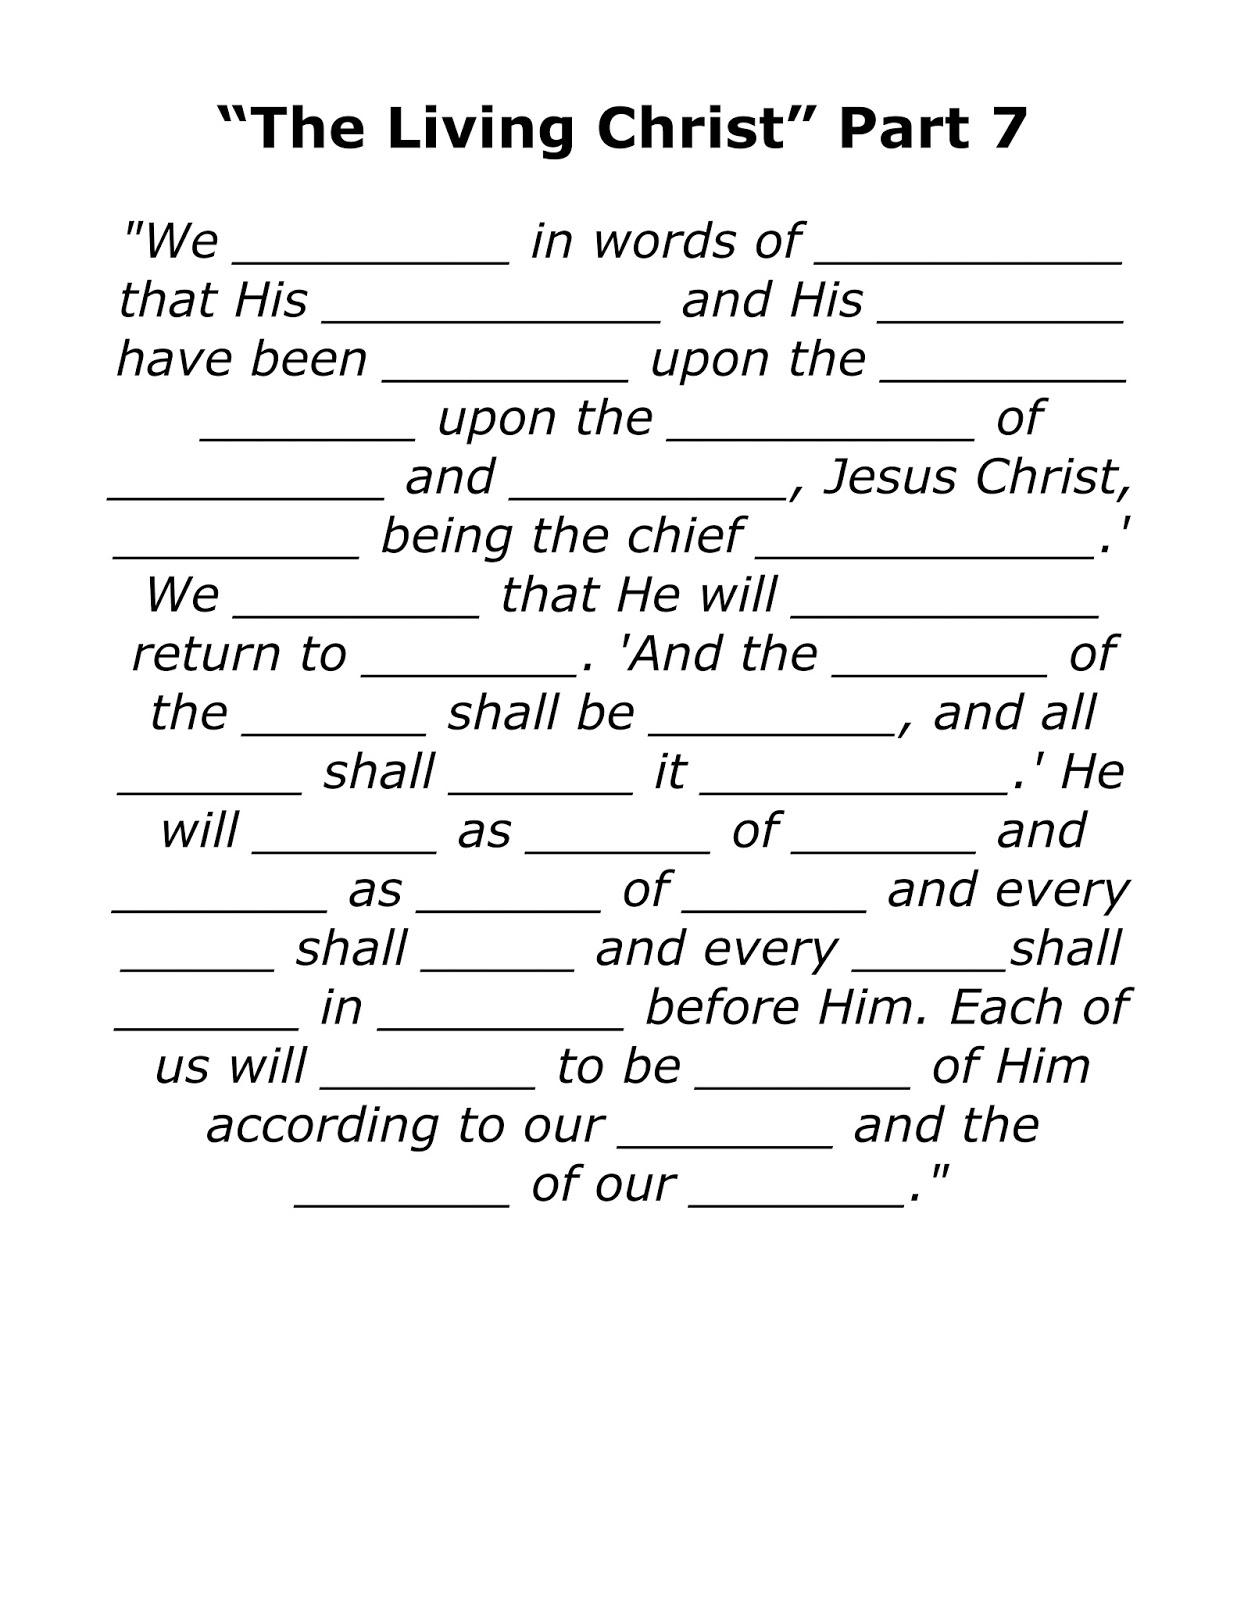 The Living Christ Songs The Living Christ Part 7